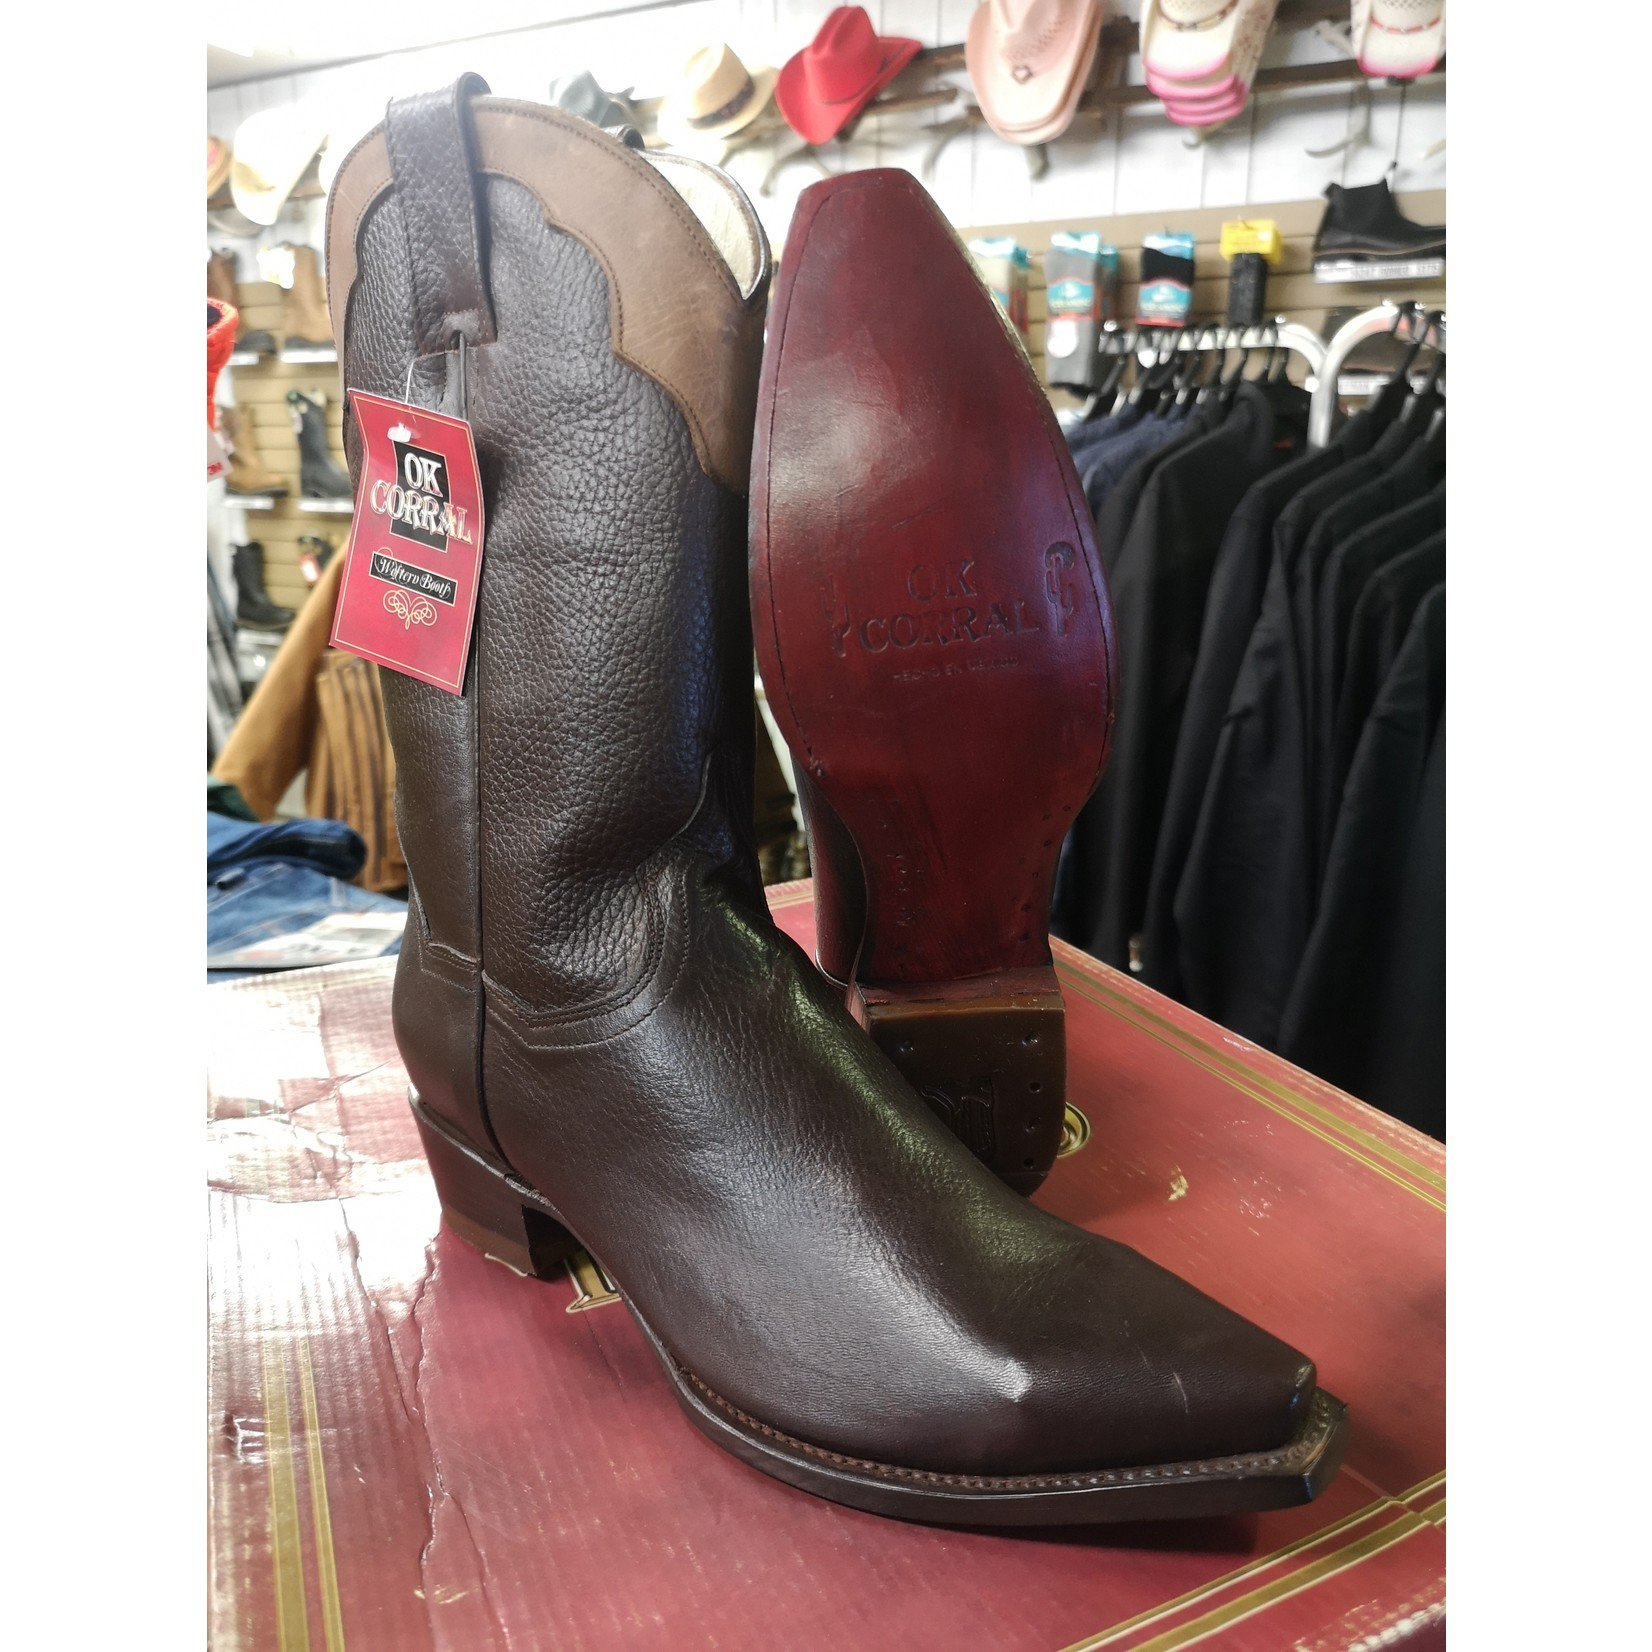 OK Corral Women's Point Toe Cowboy Boot - Cristina - Size 8.5